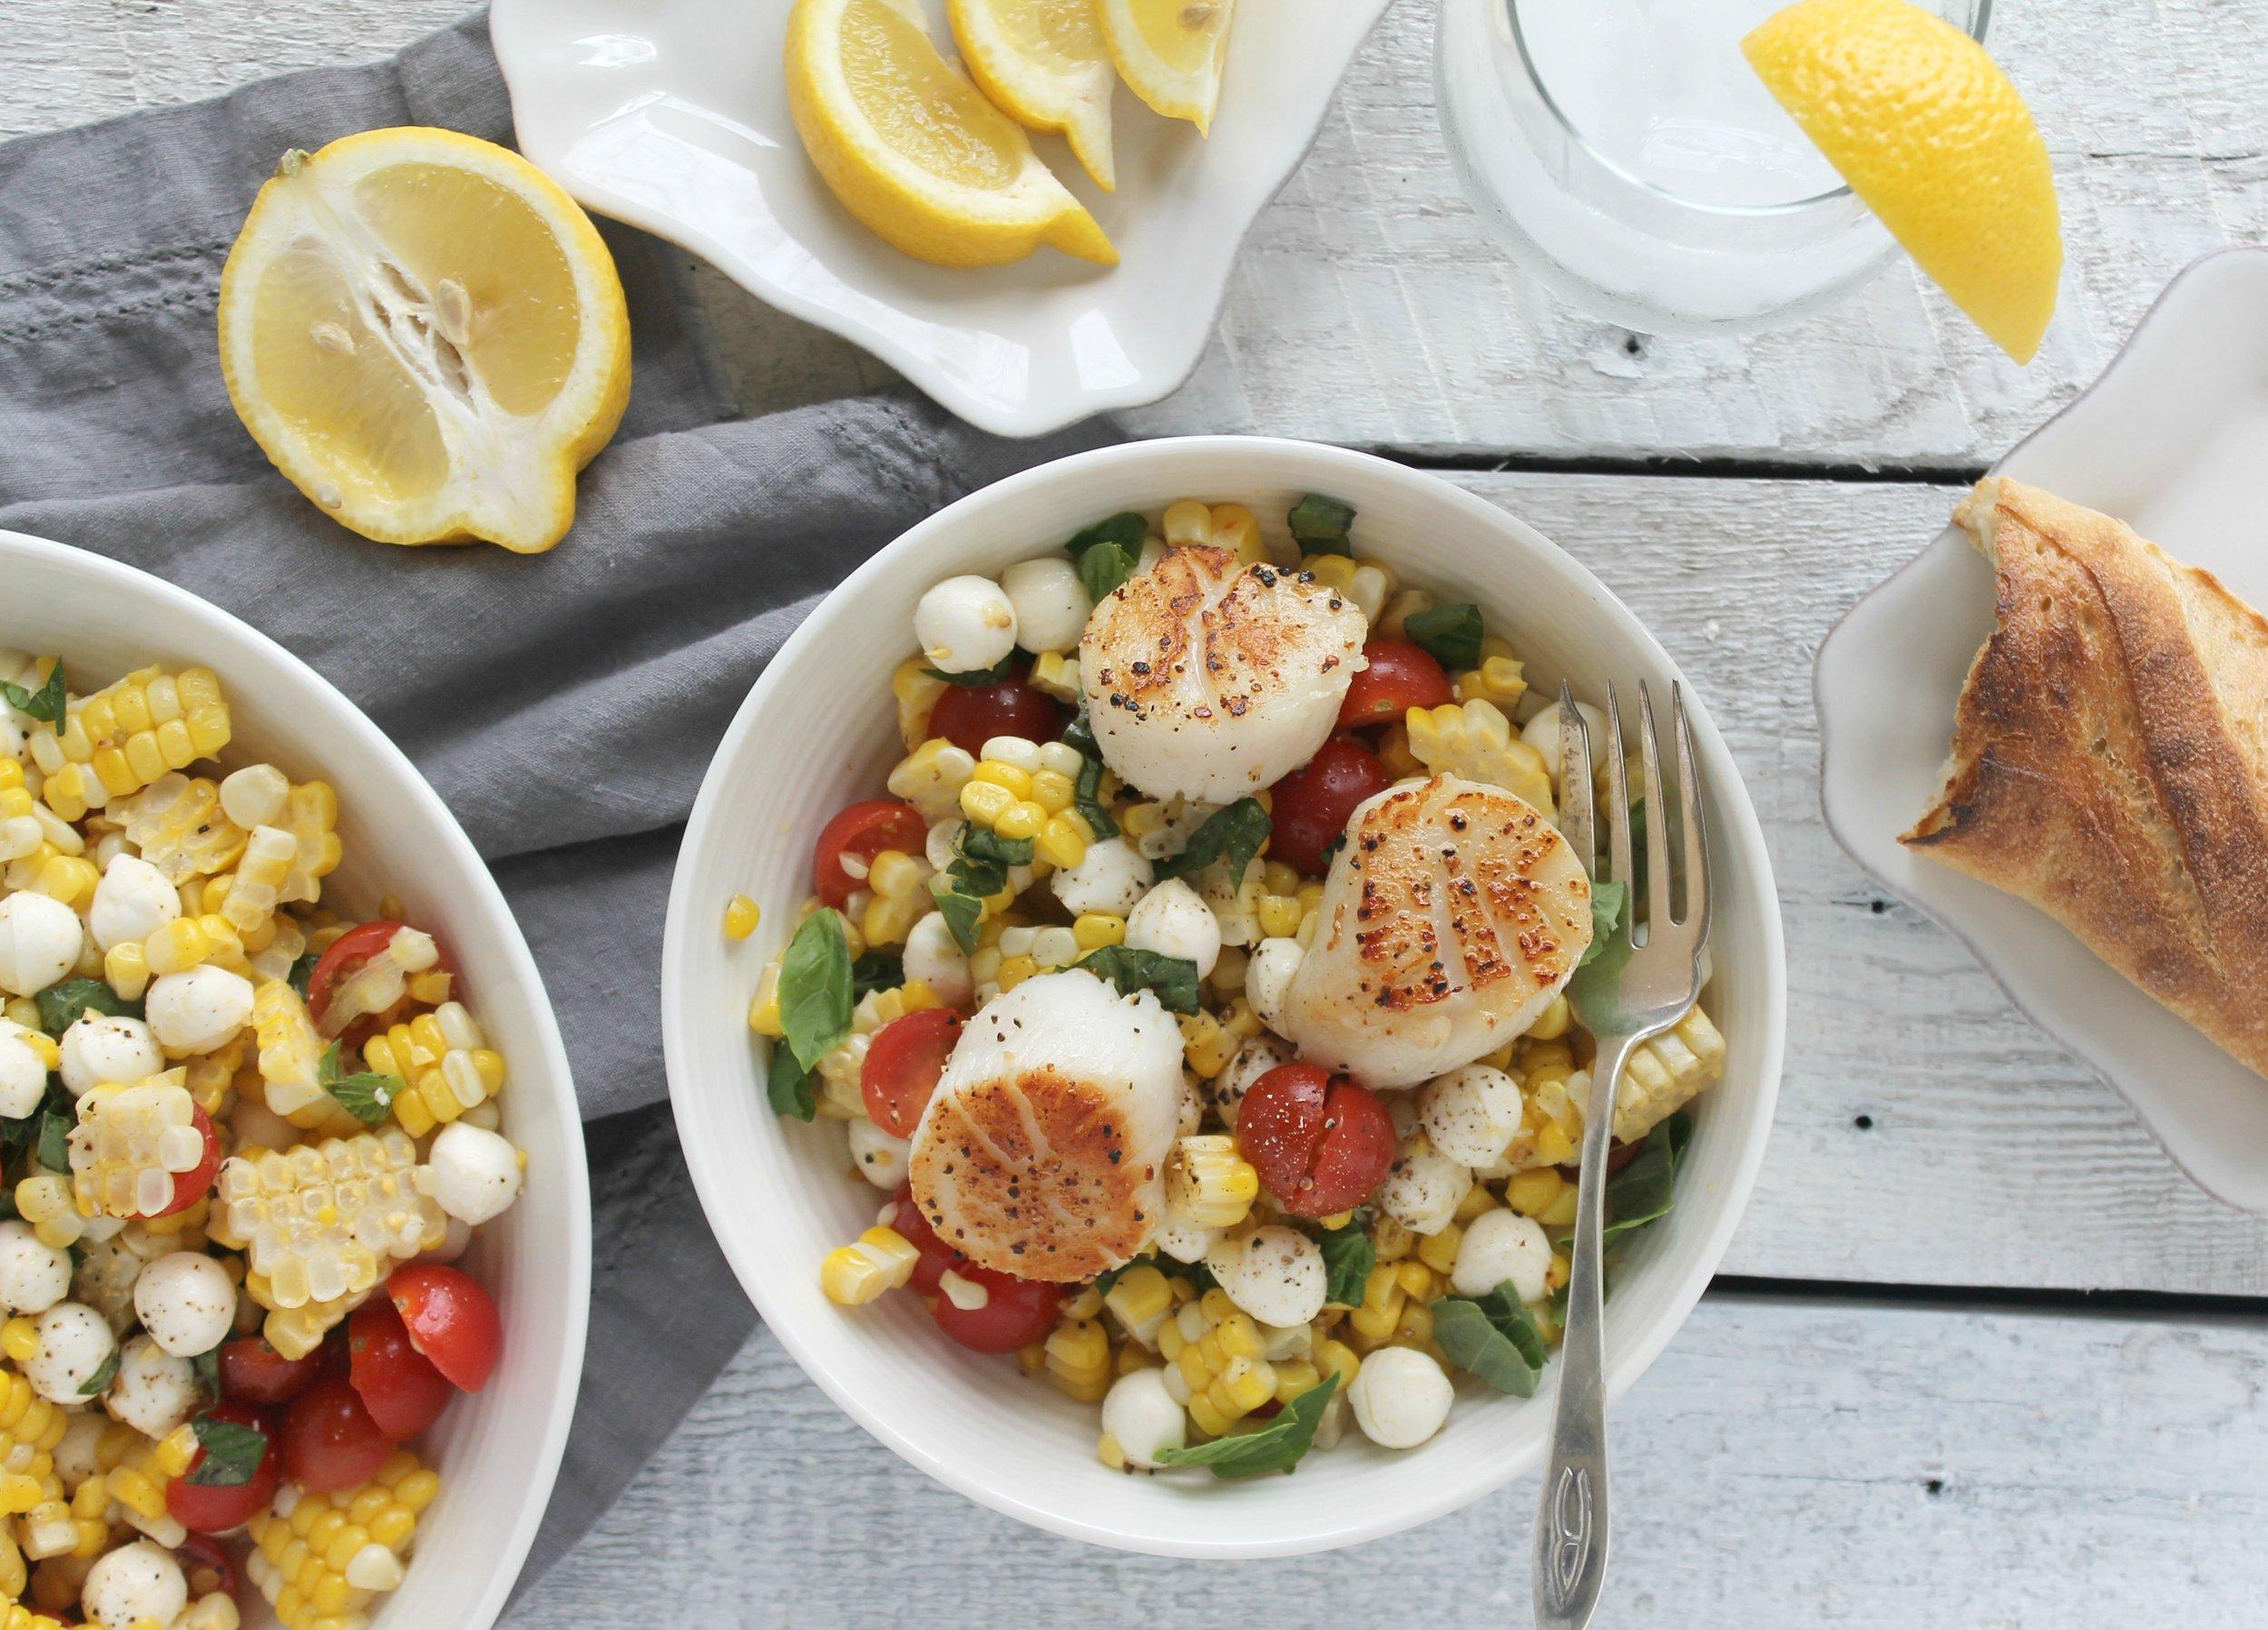 Scallops-with-Corn-Tomato-Basil-Salad-3.jpg